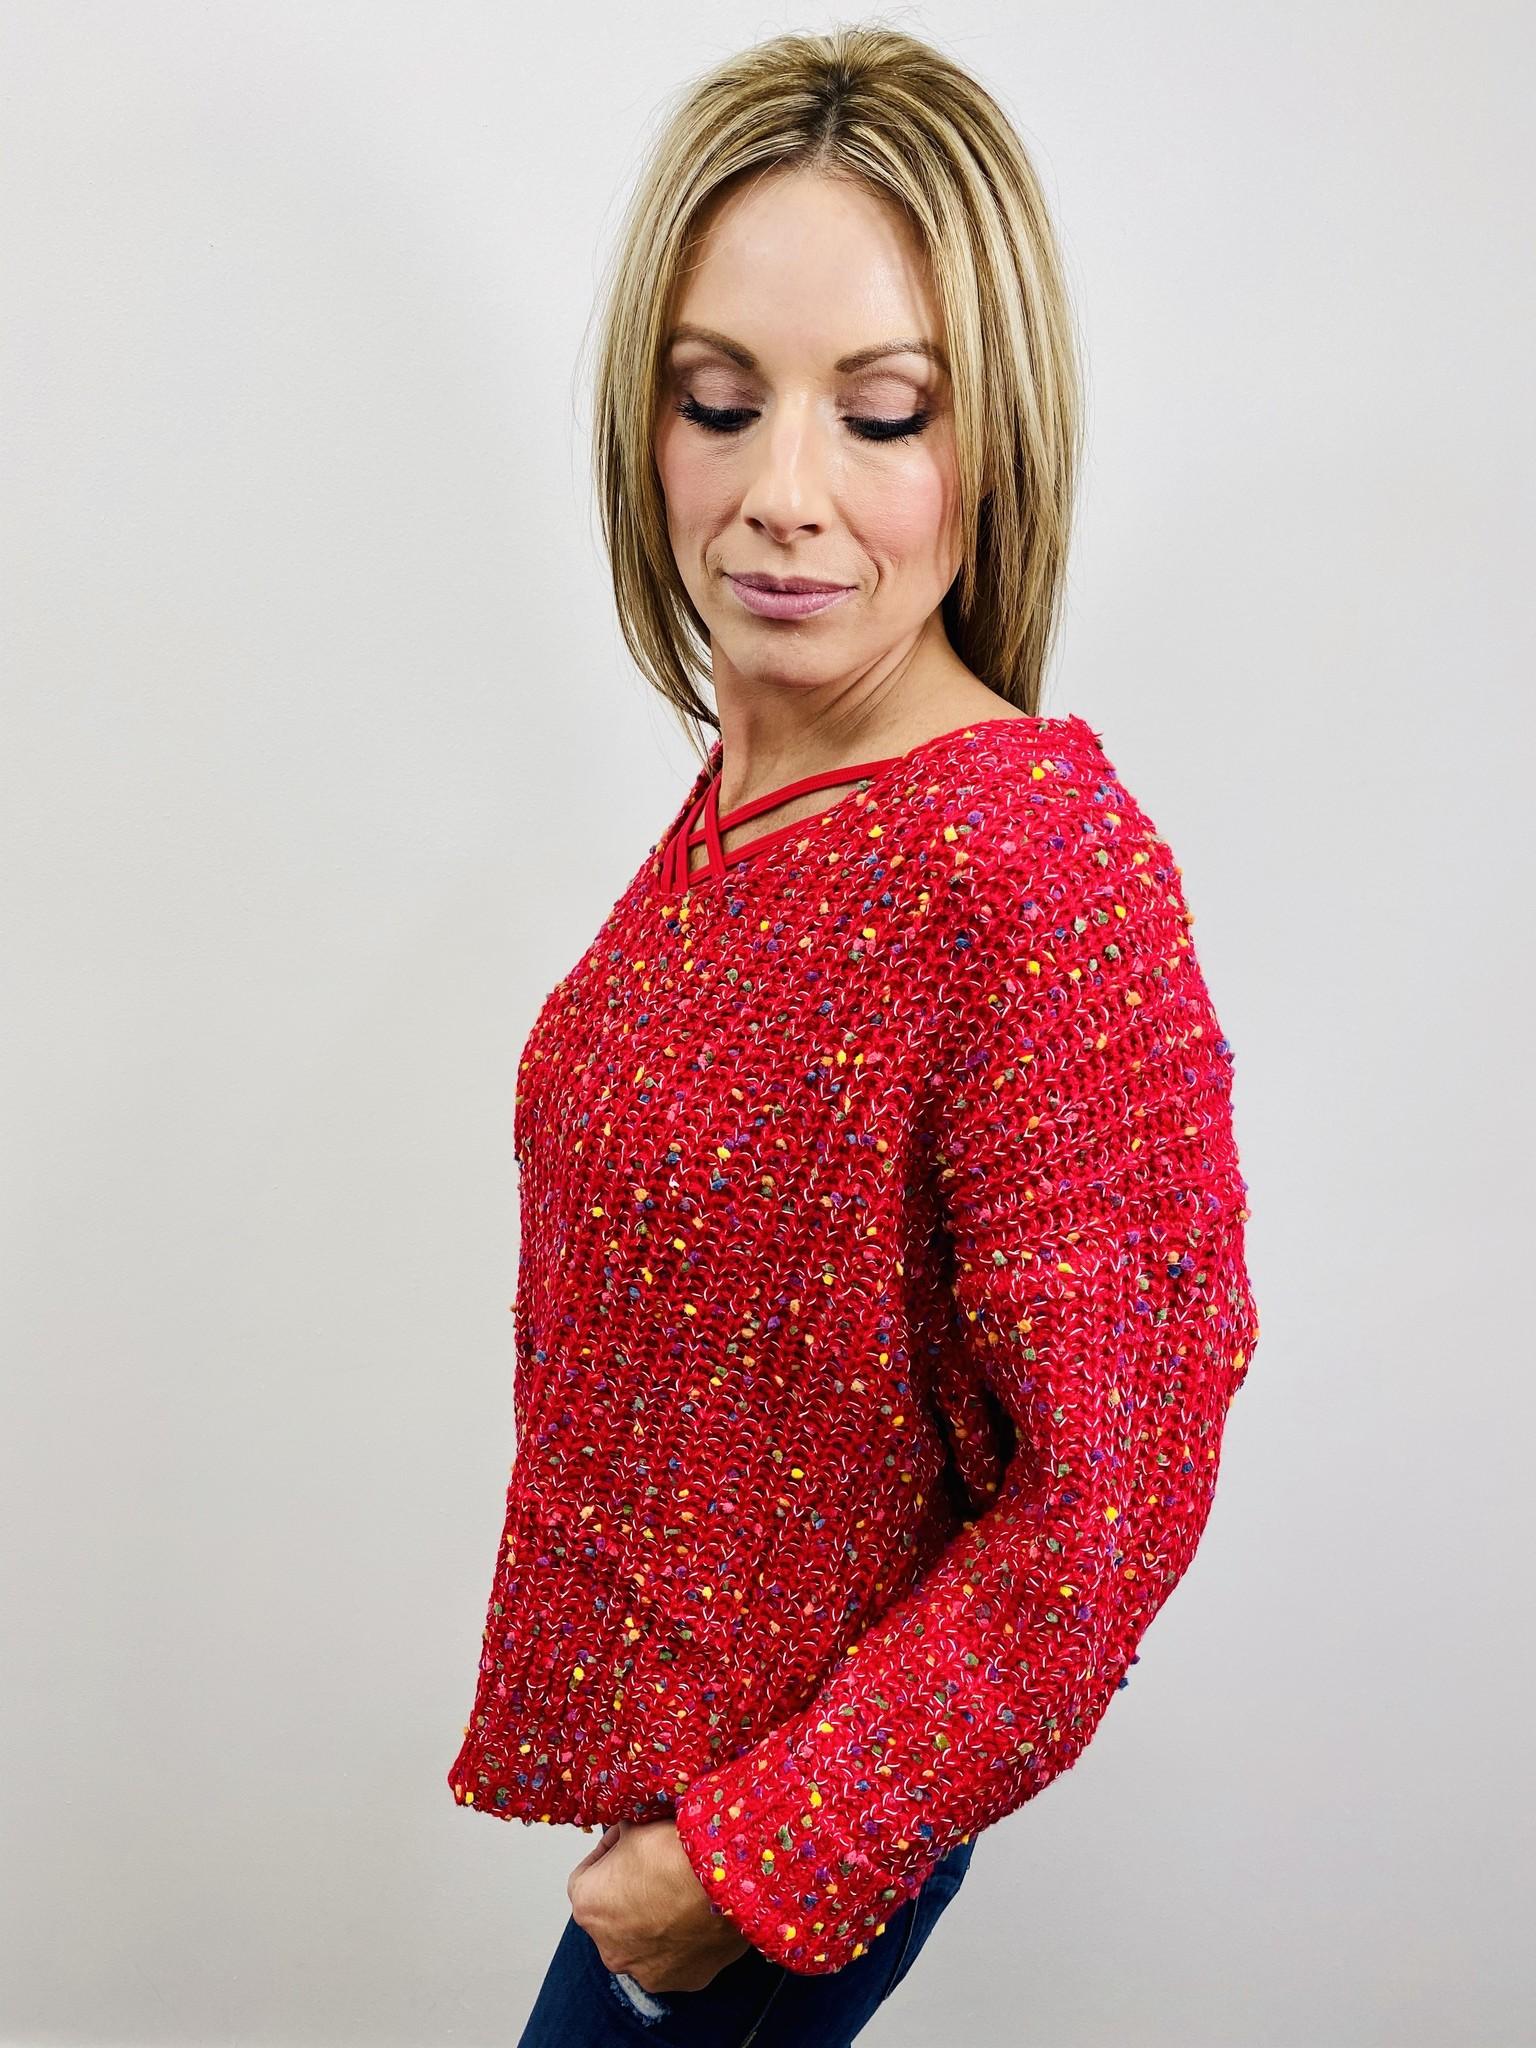 Main Strip Popcorn Sweater - Red